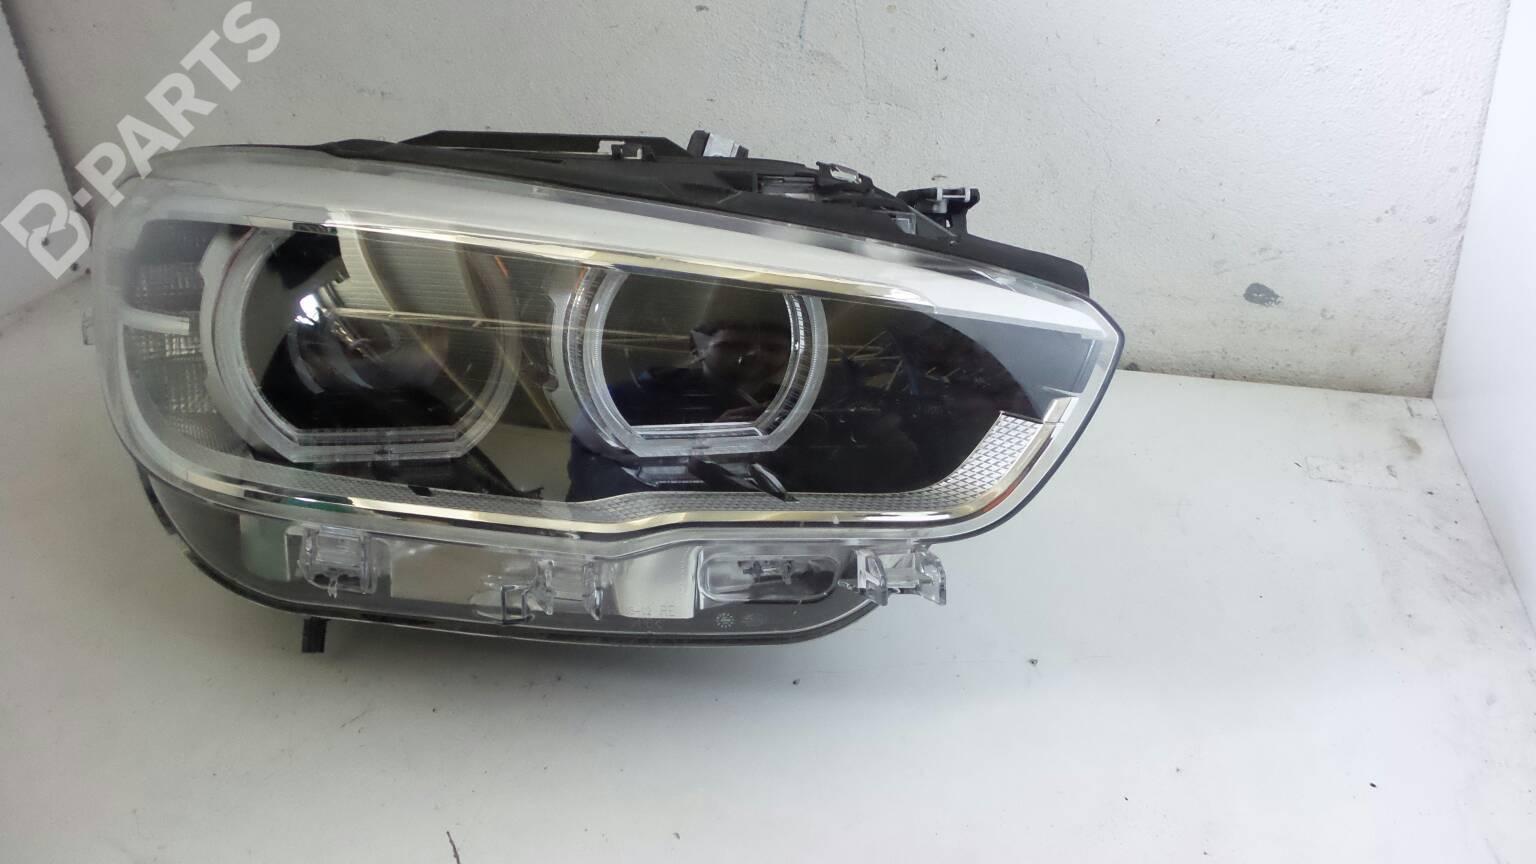 Right Headlight Bmw 1 F20 180992 Fuse Box 747134001 01192902 5 Doors